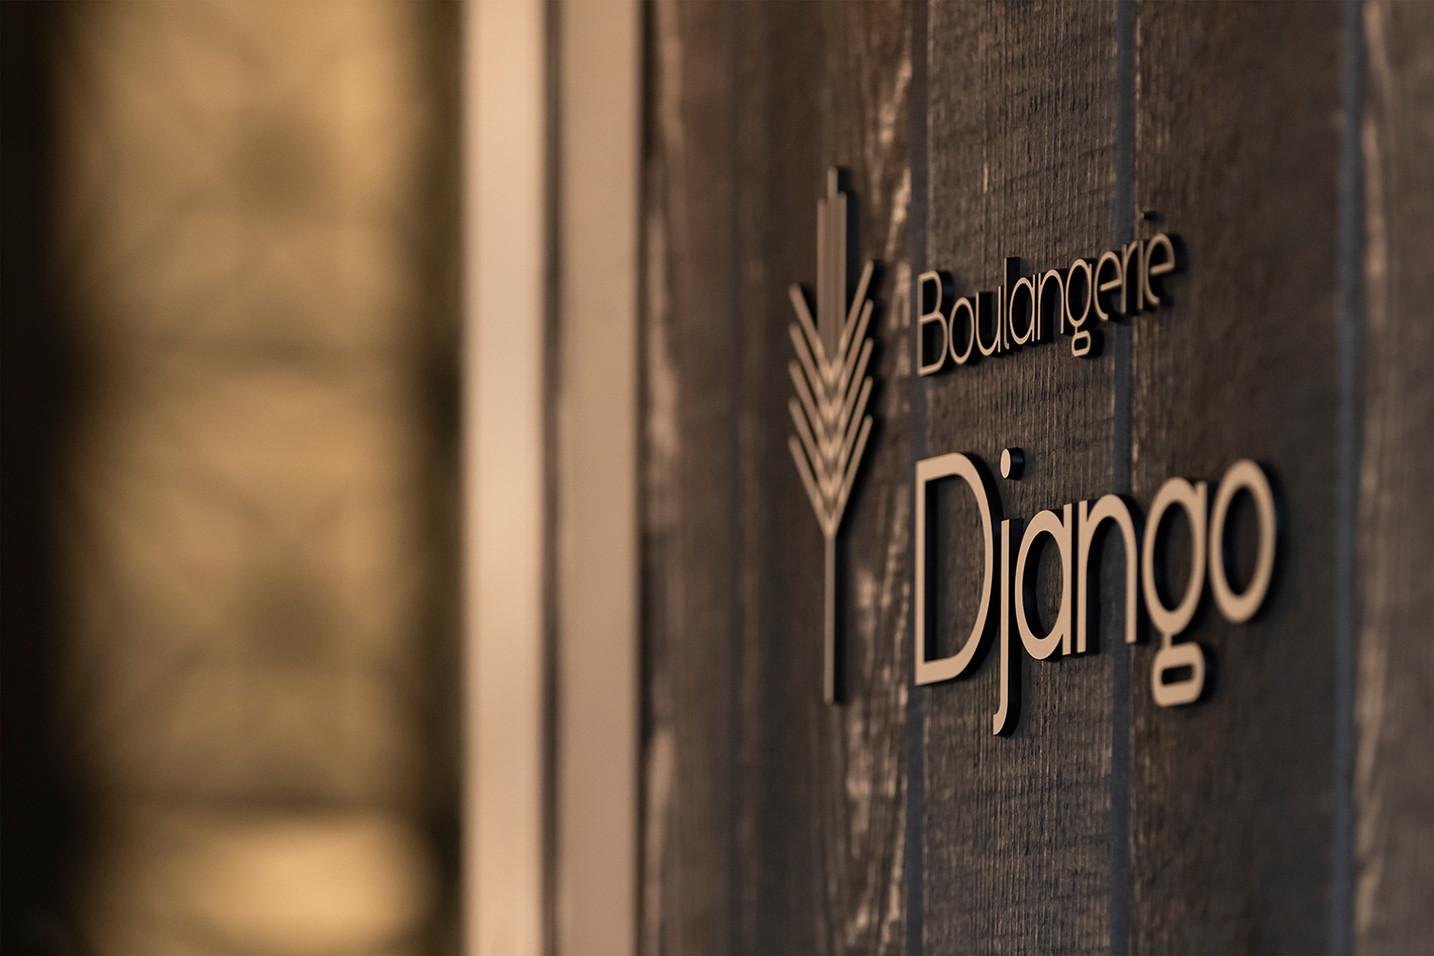 Boulangerie Django(logo)